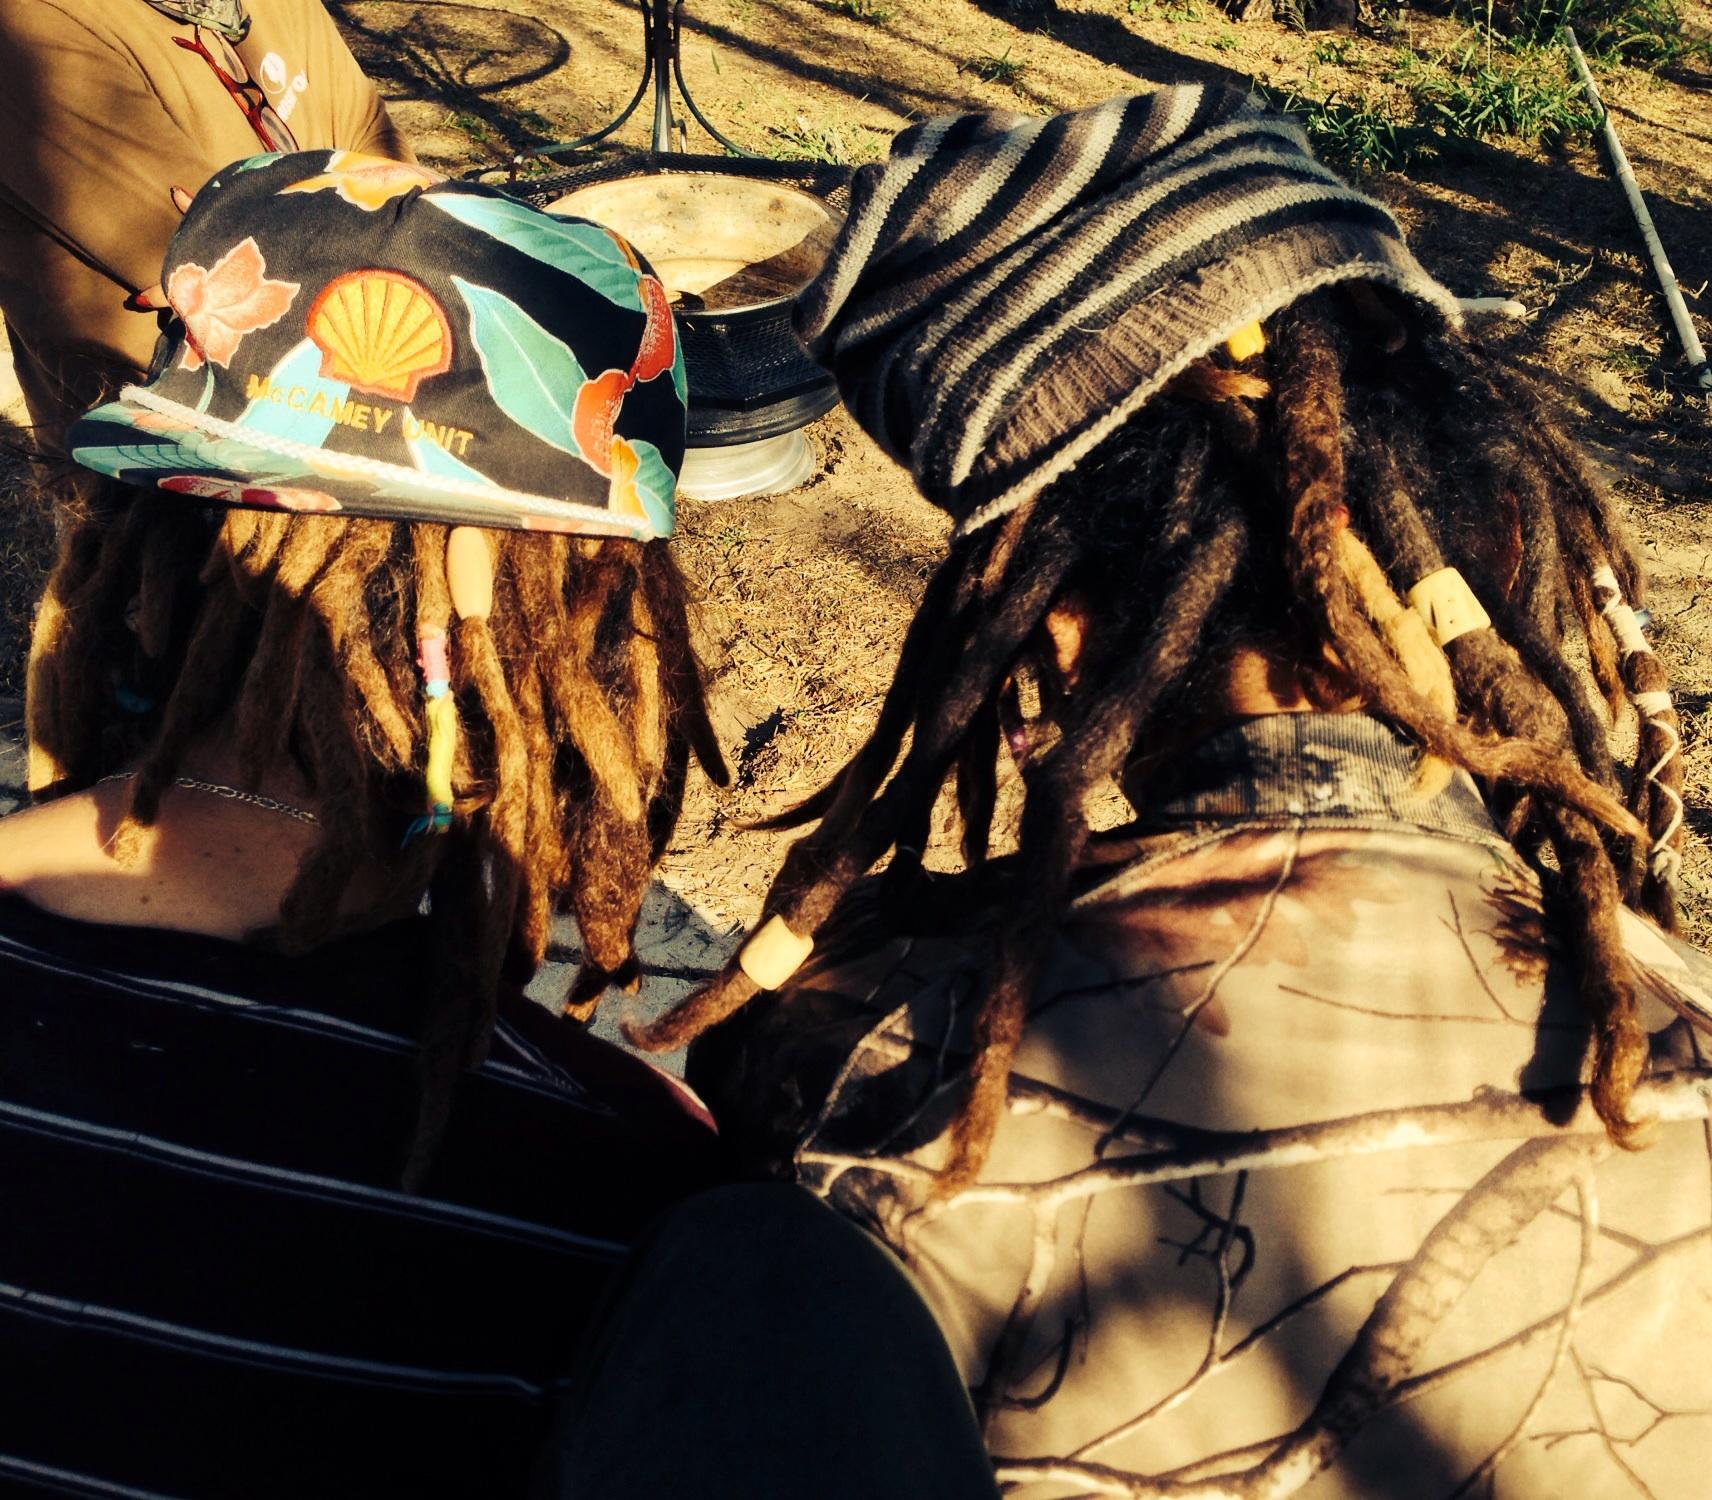 Tribal Seeds Dreads Deezystone Tribal Seeds in